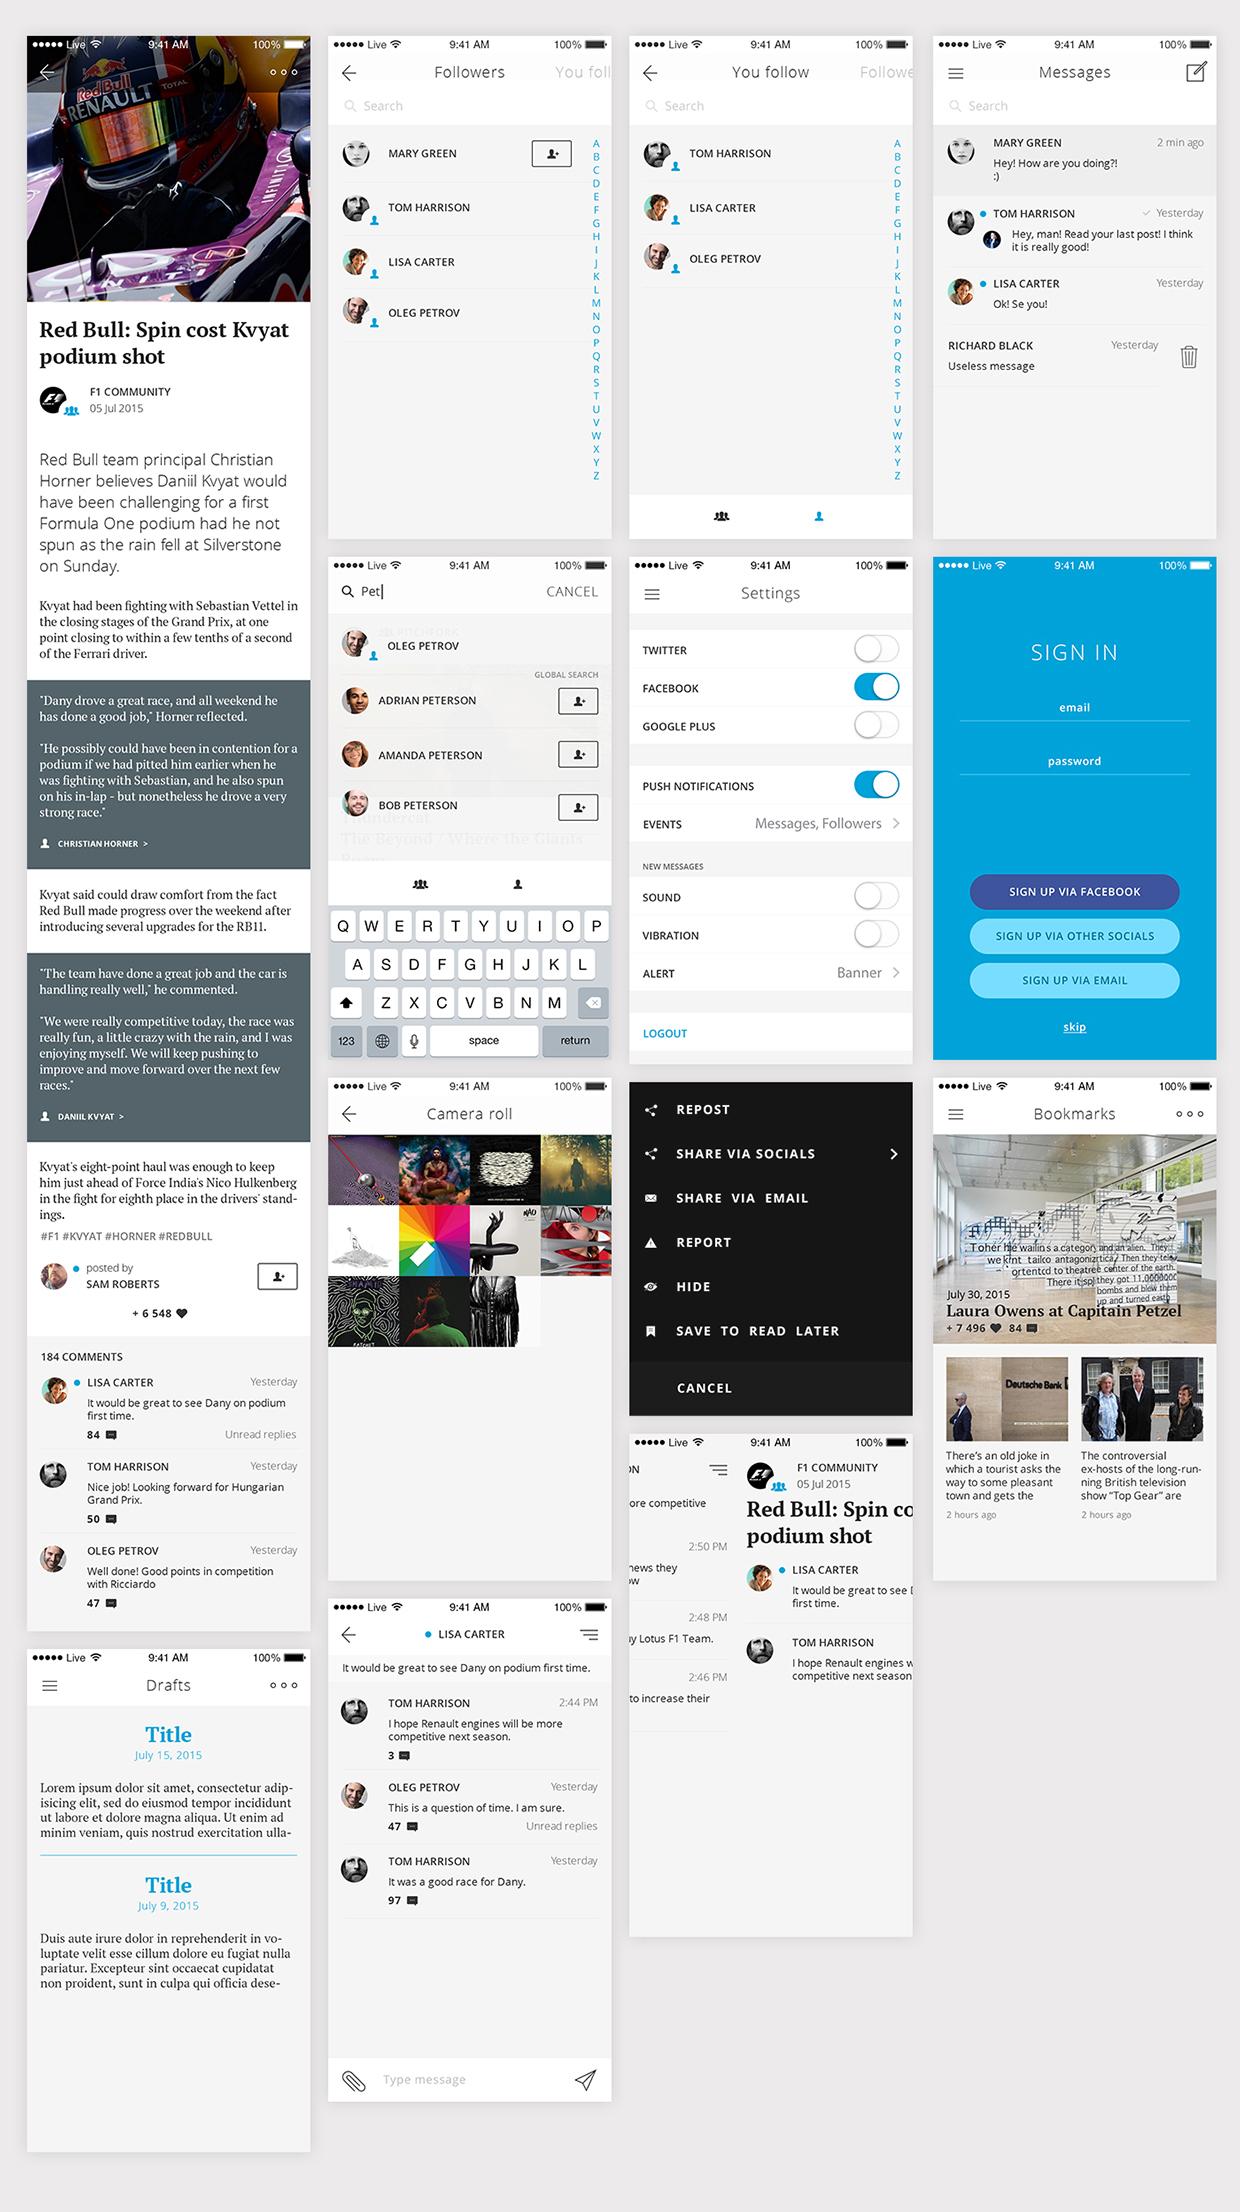 iOS Livejournal Redesign Concept